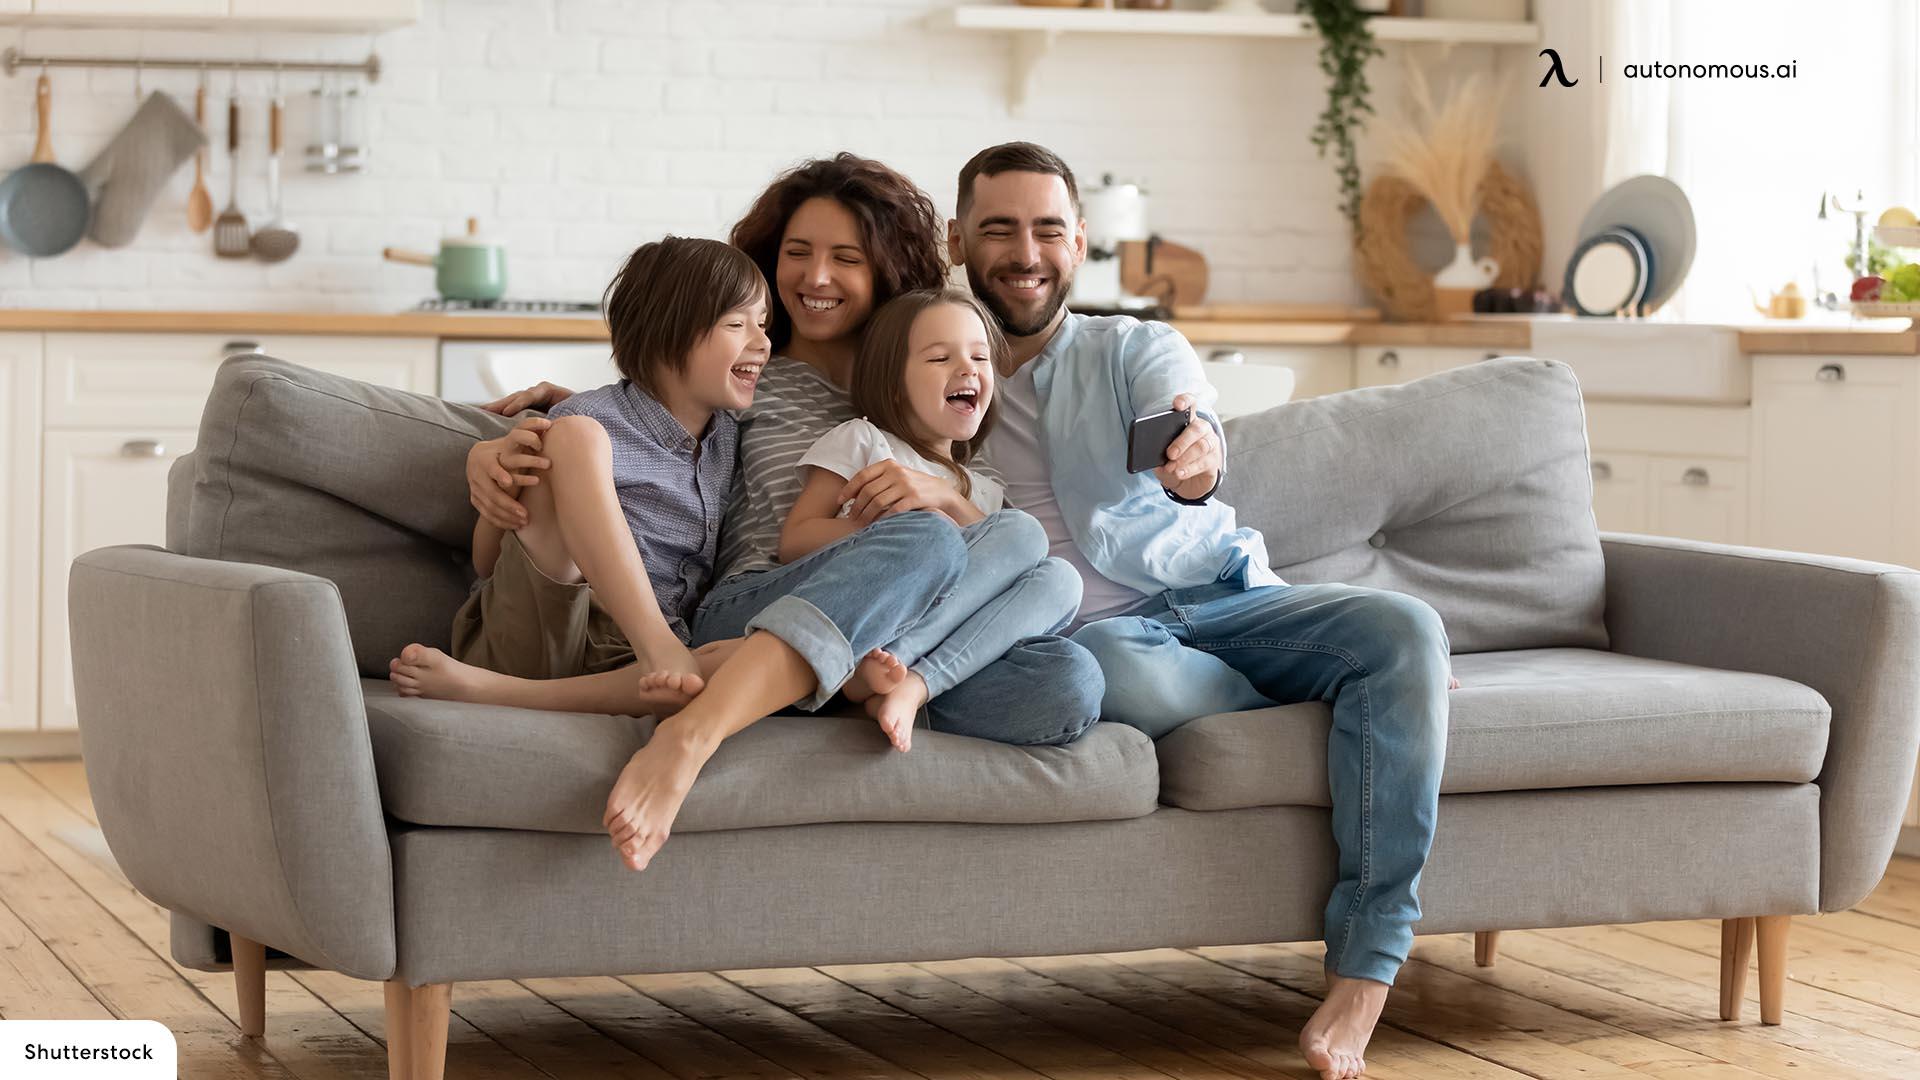 Family-friendly employee benefits